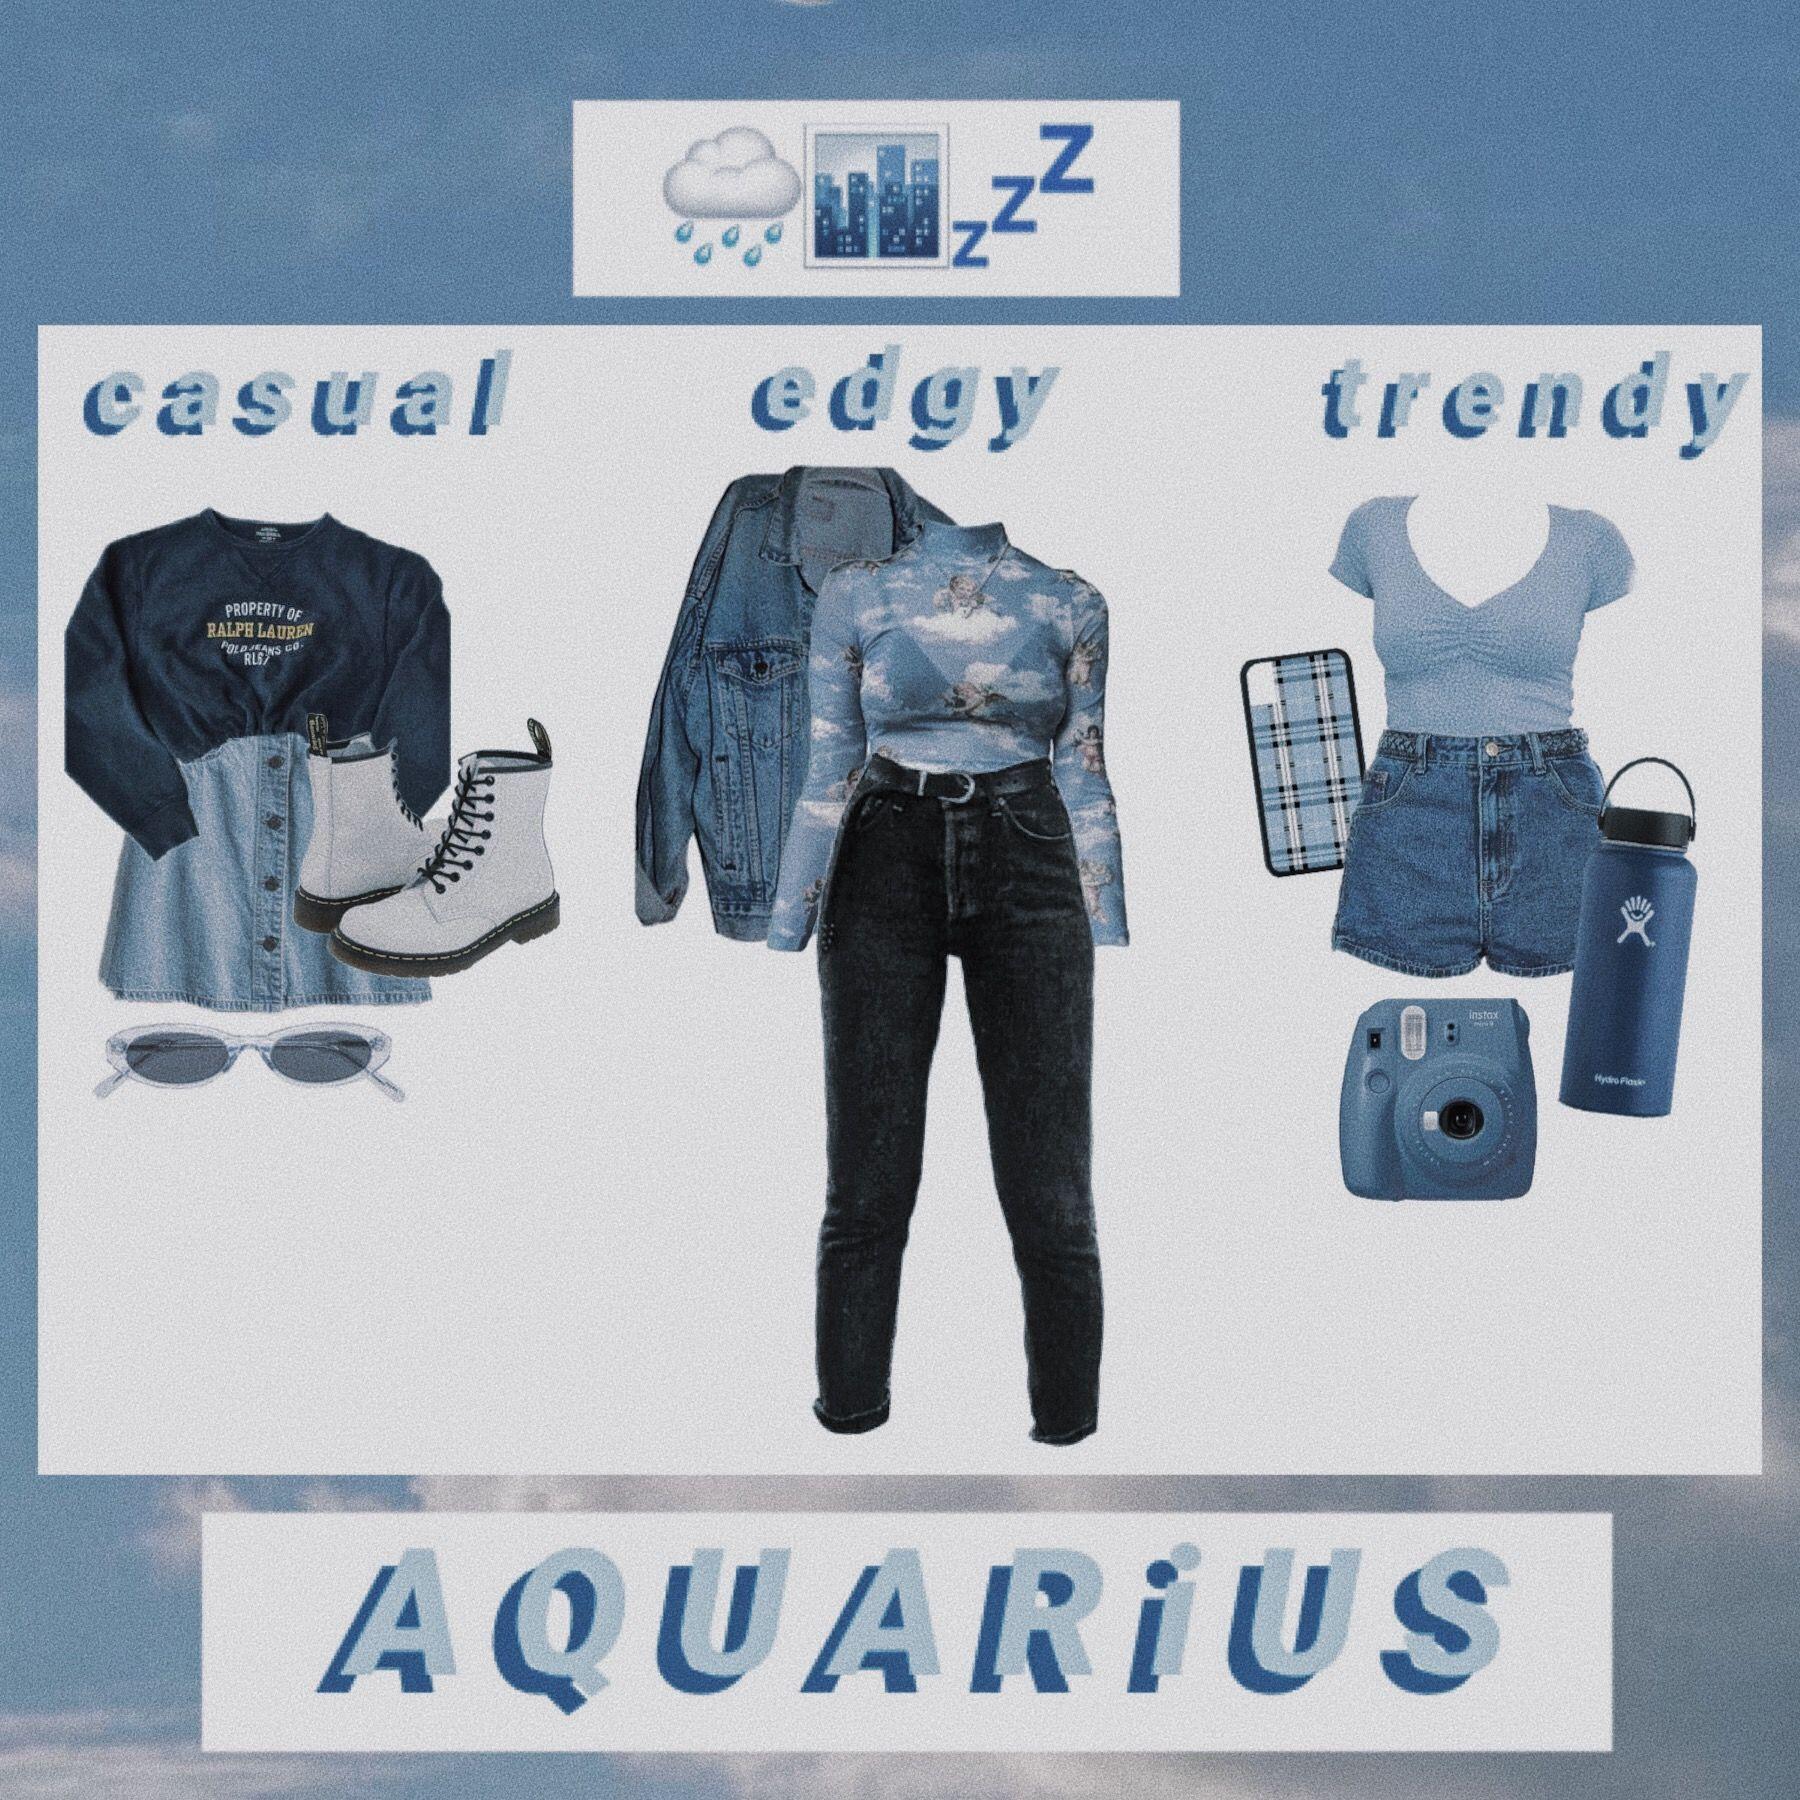 A Q U R I S Mood Board Aesthetic Zodiac Outfit Moodboard Aquariu Blue Casual Edgy Trendy Fashion Style Clothes Custom Paraphrase Clothing